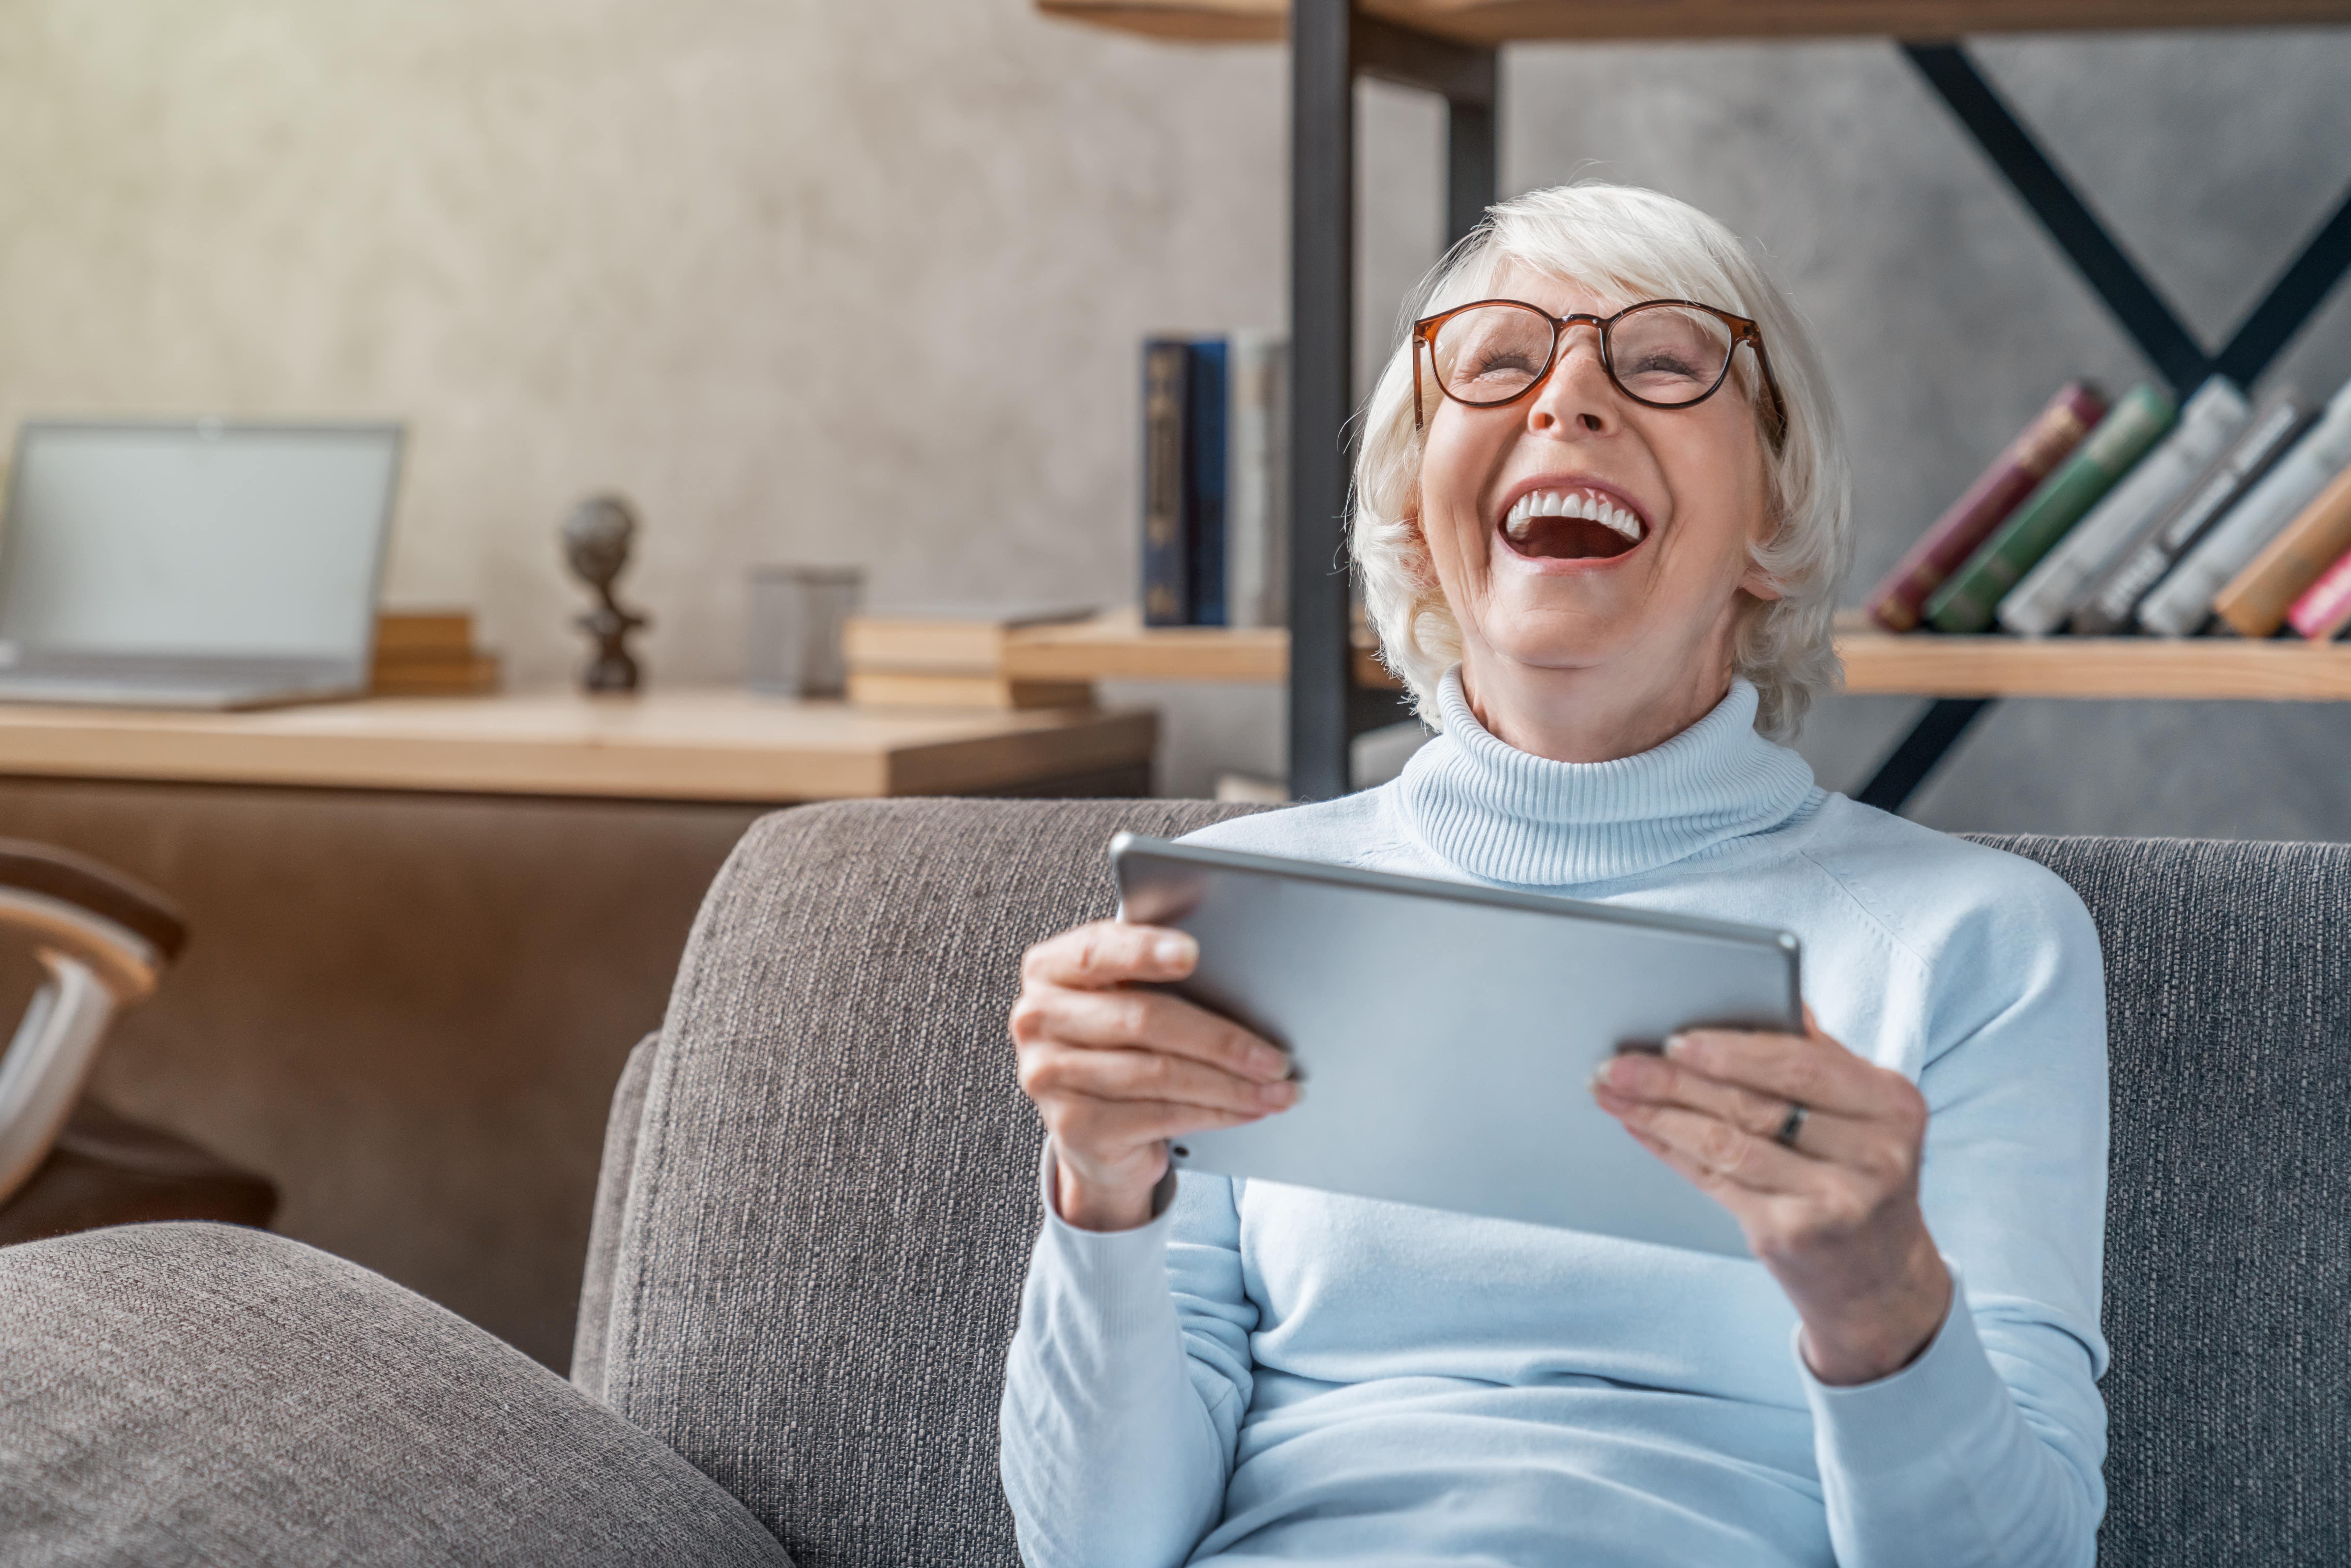 15 Slang Words Seniors Should Know